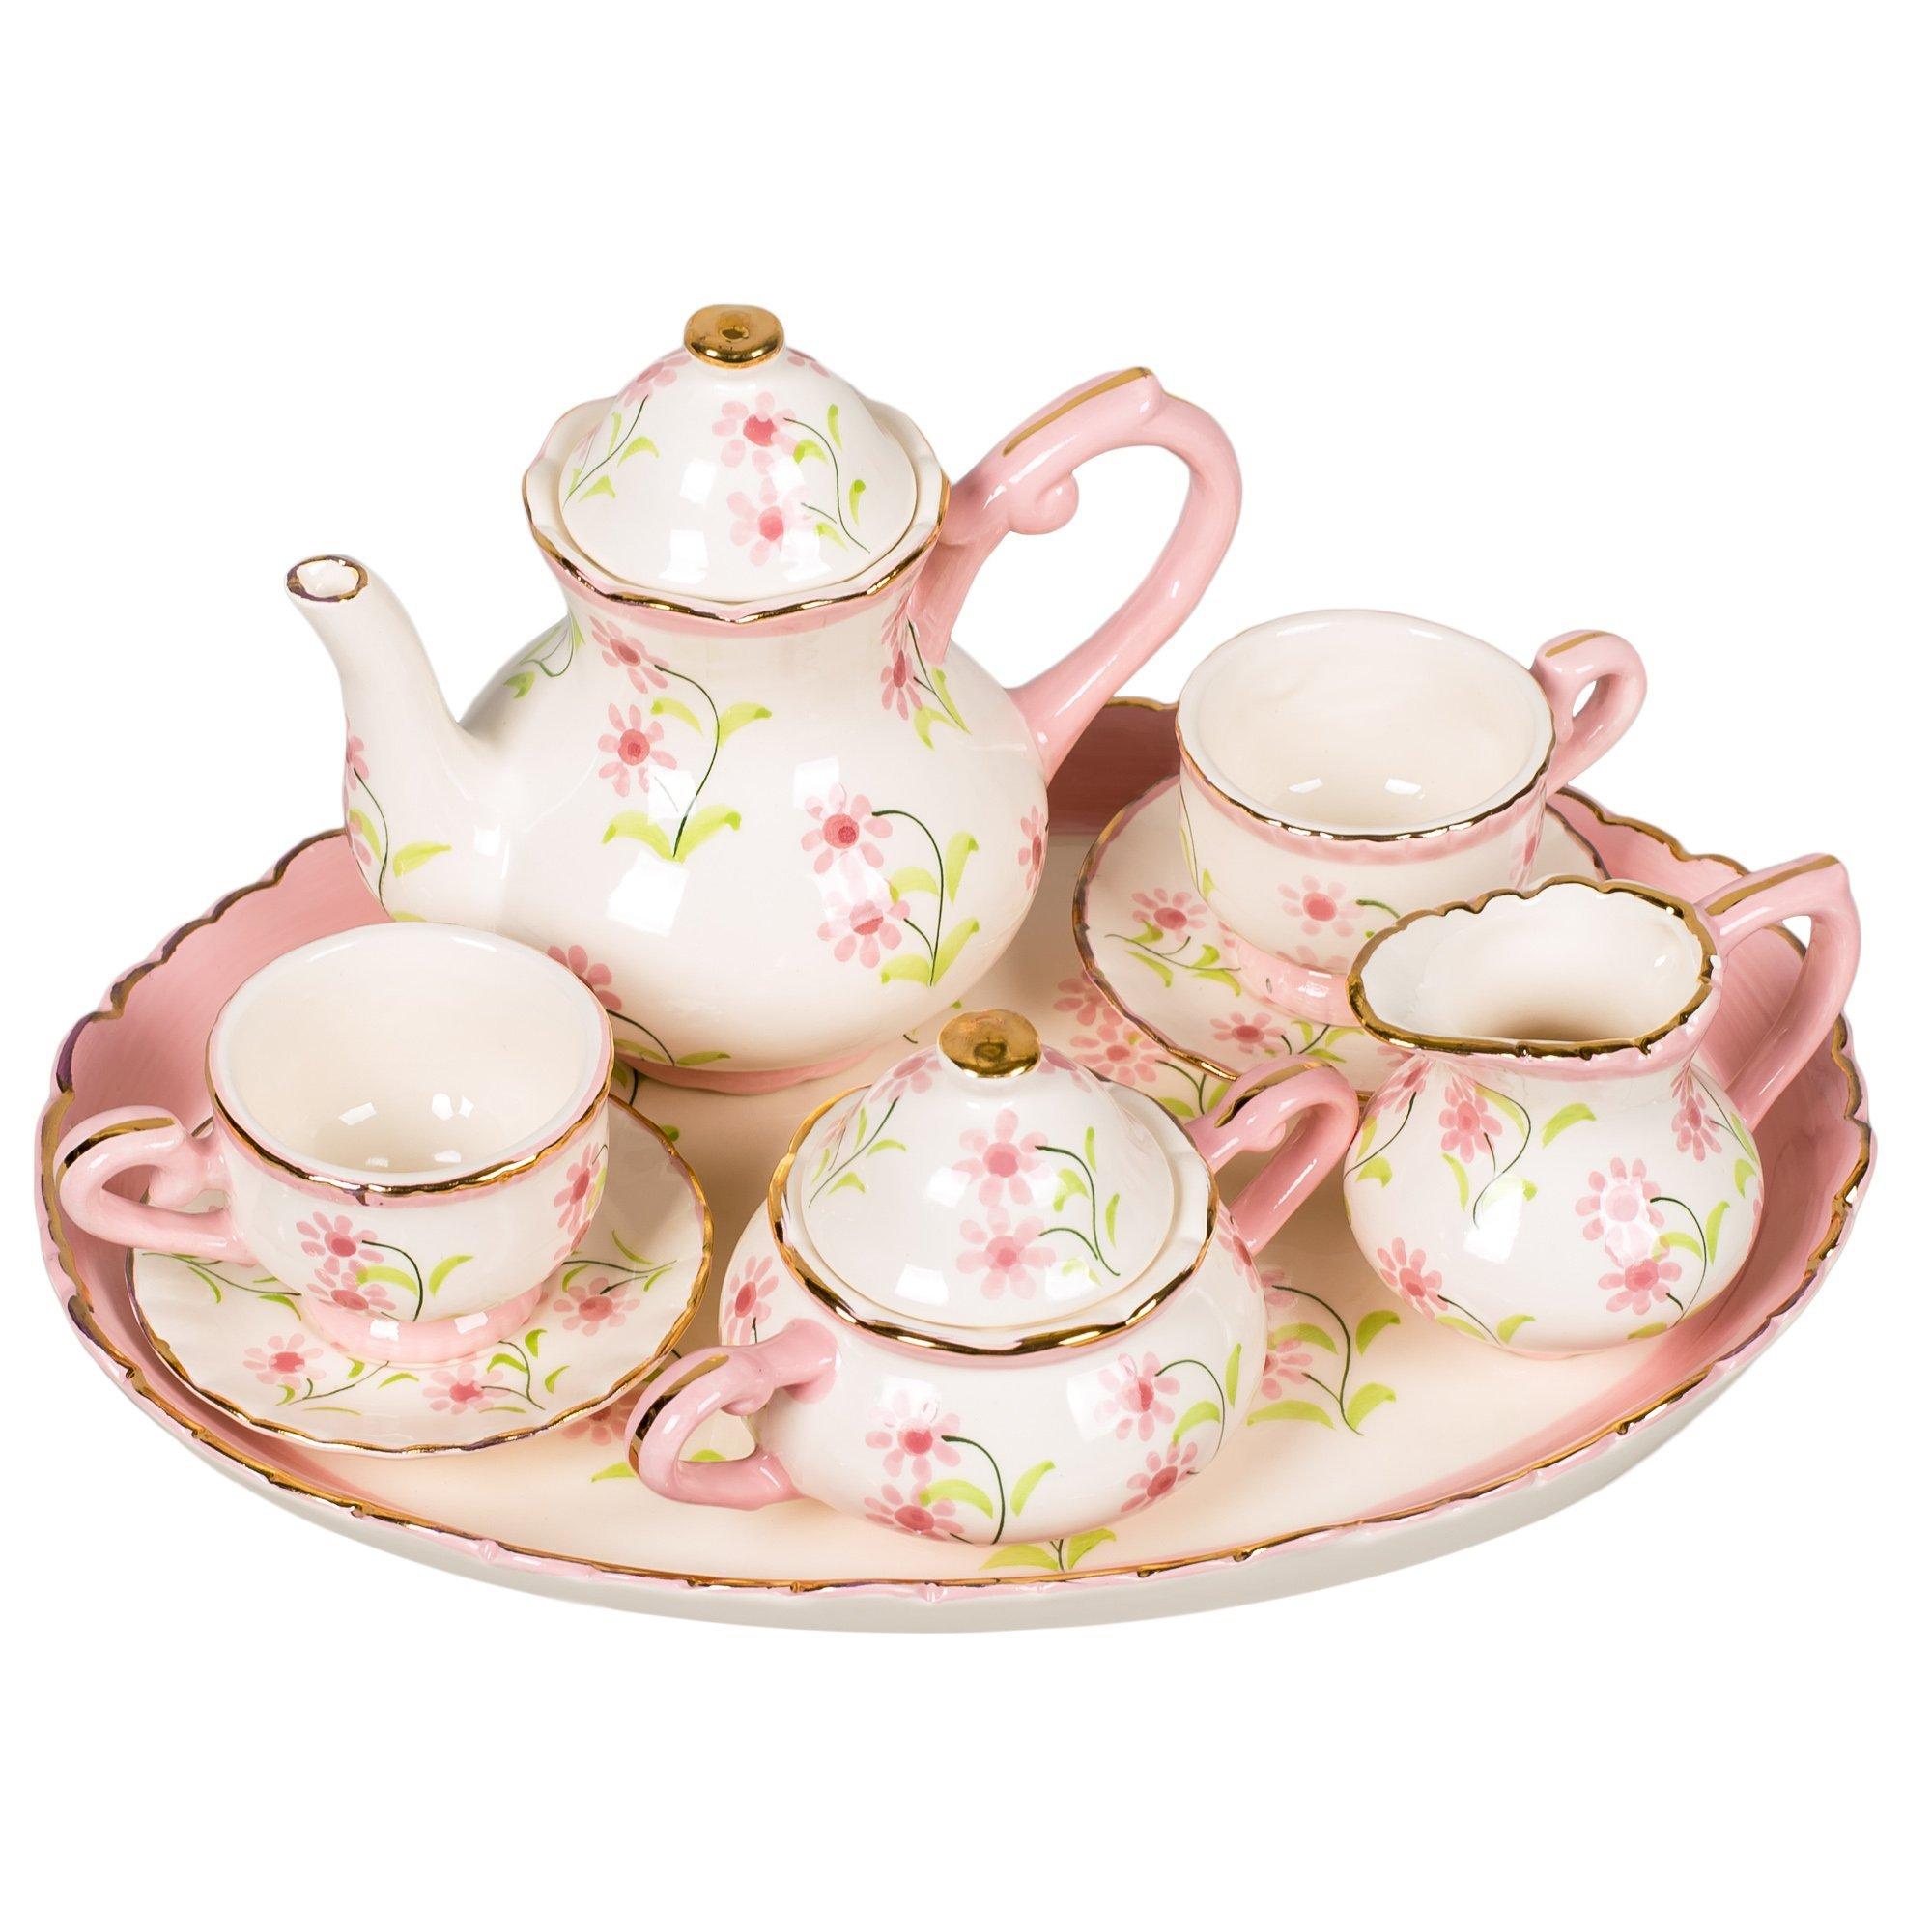 Pink and White Flower Sprigs Design White Porcelain Children's Tea Party Set